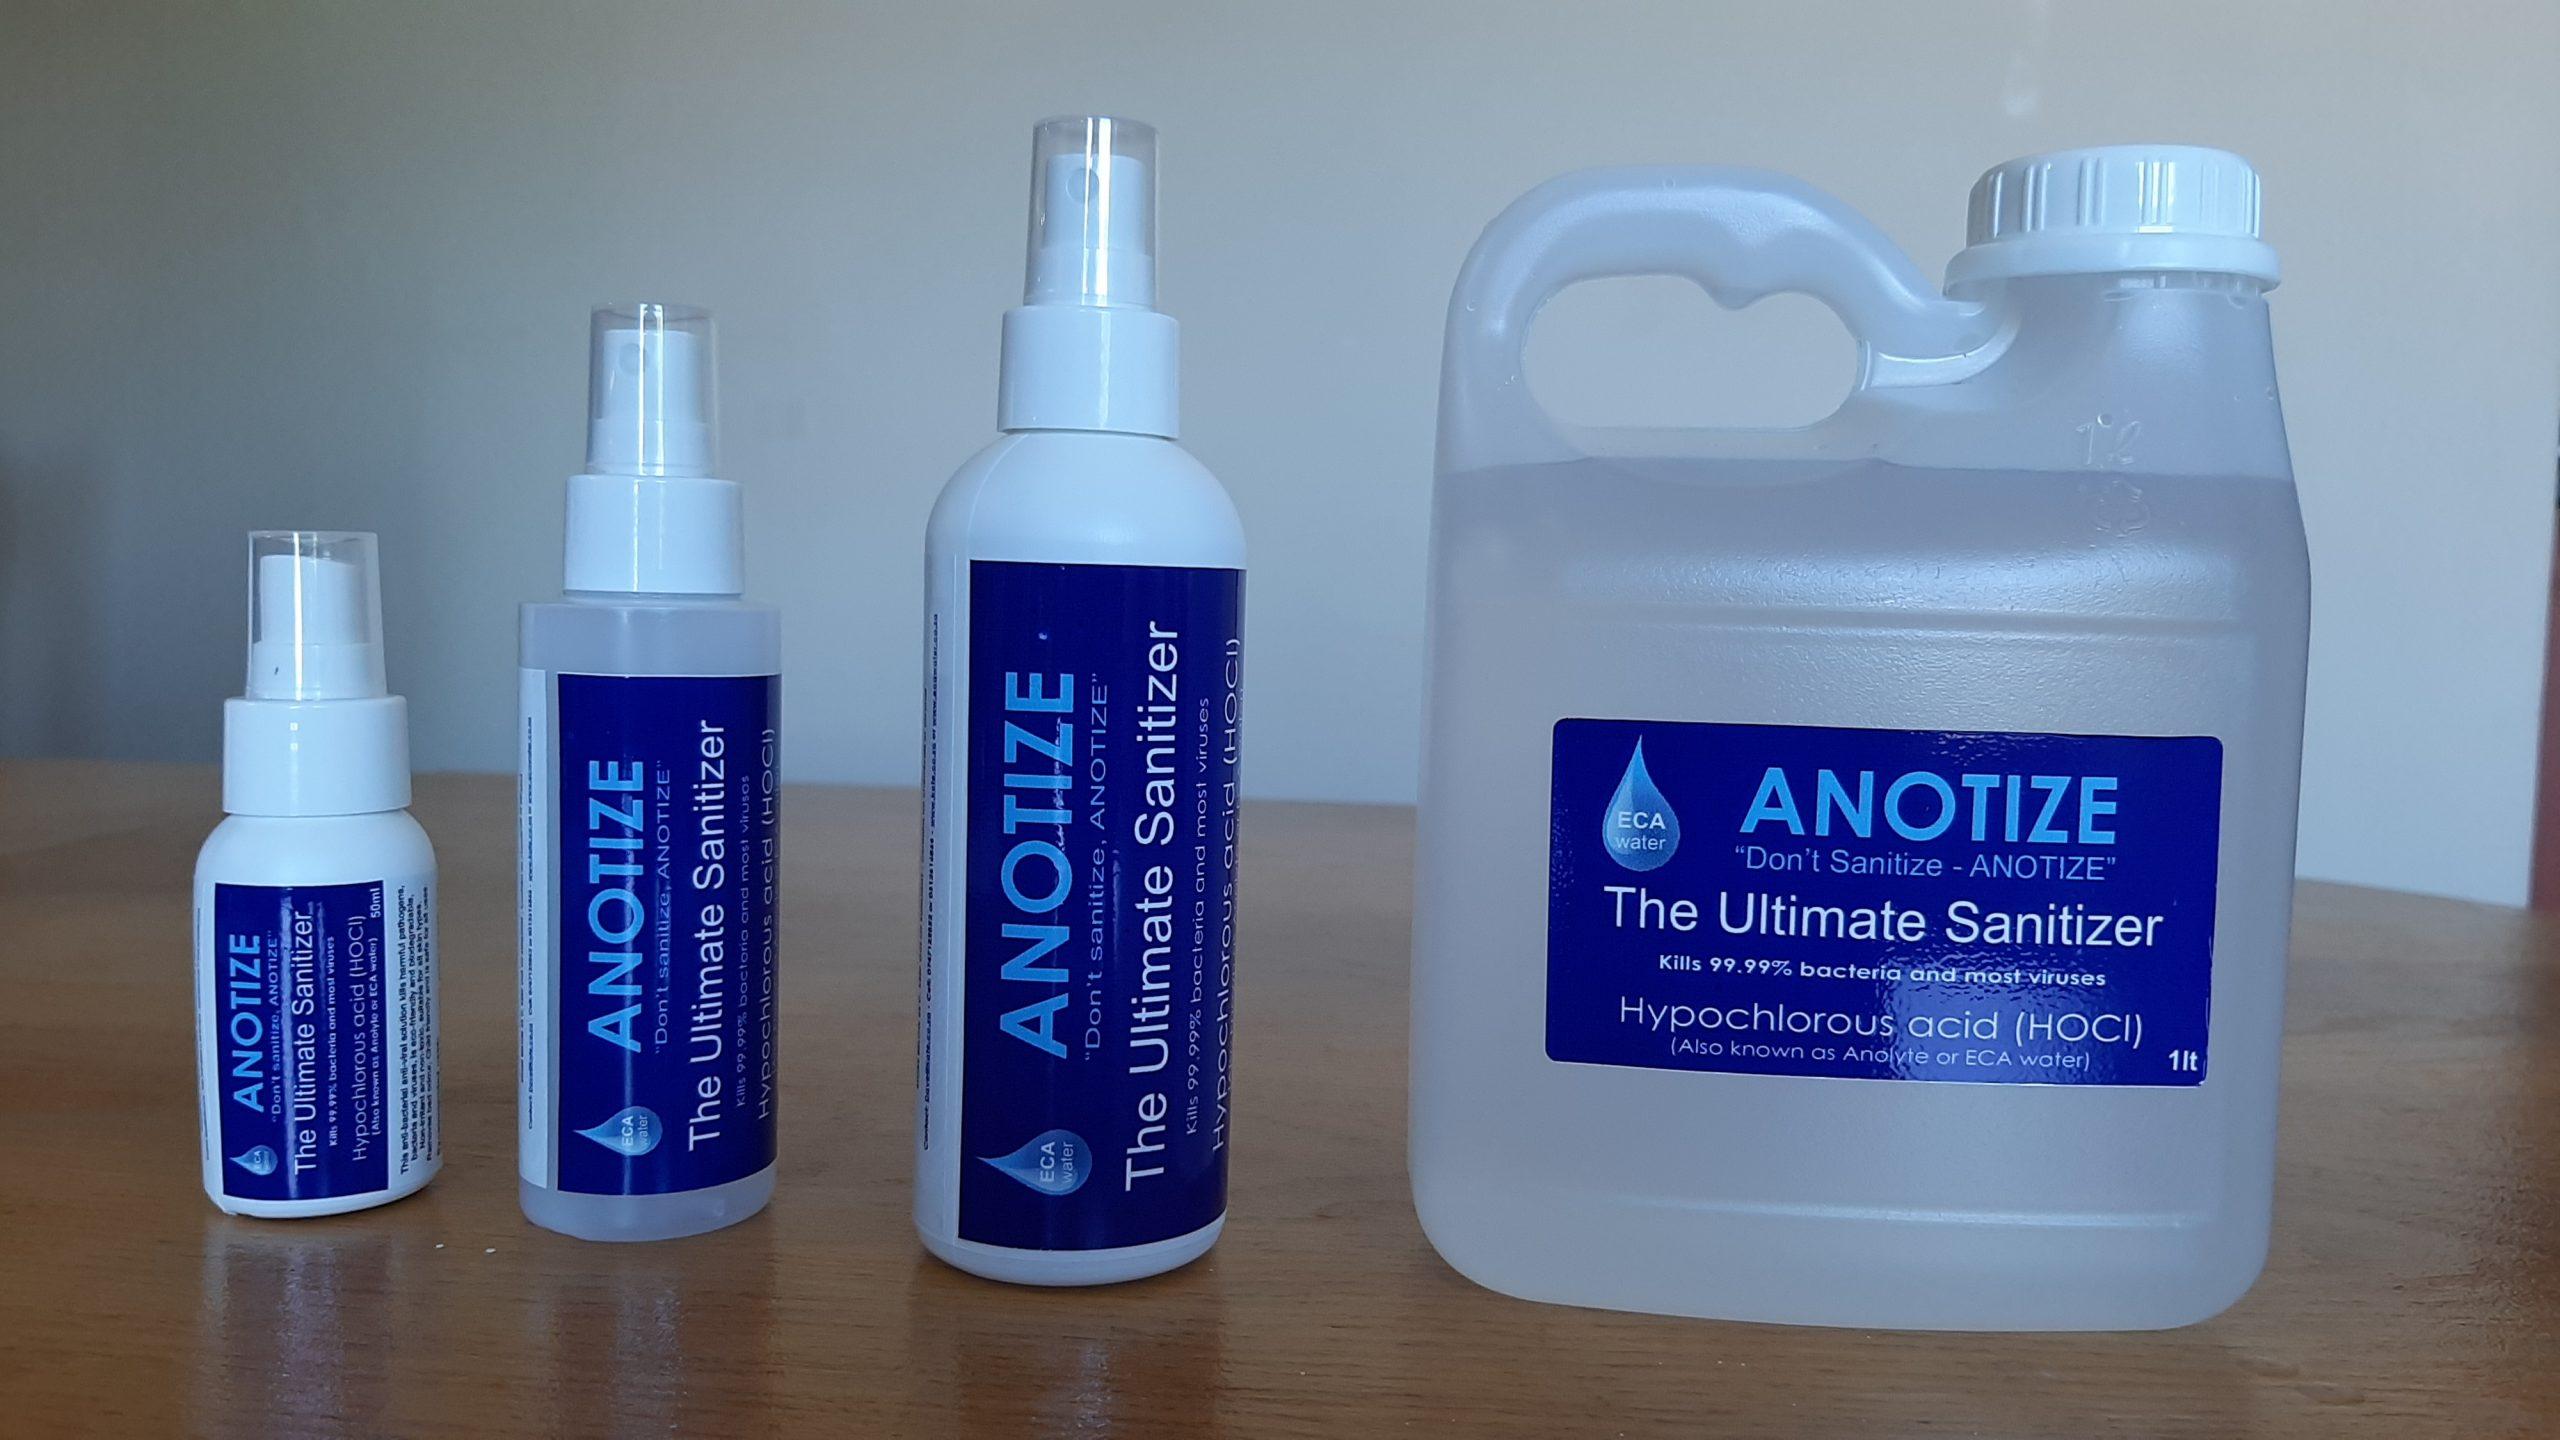 50ml, 100ml, 200ml Spray bottle and 1lt jug of sanitizer